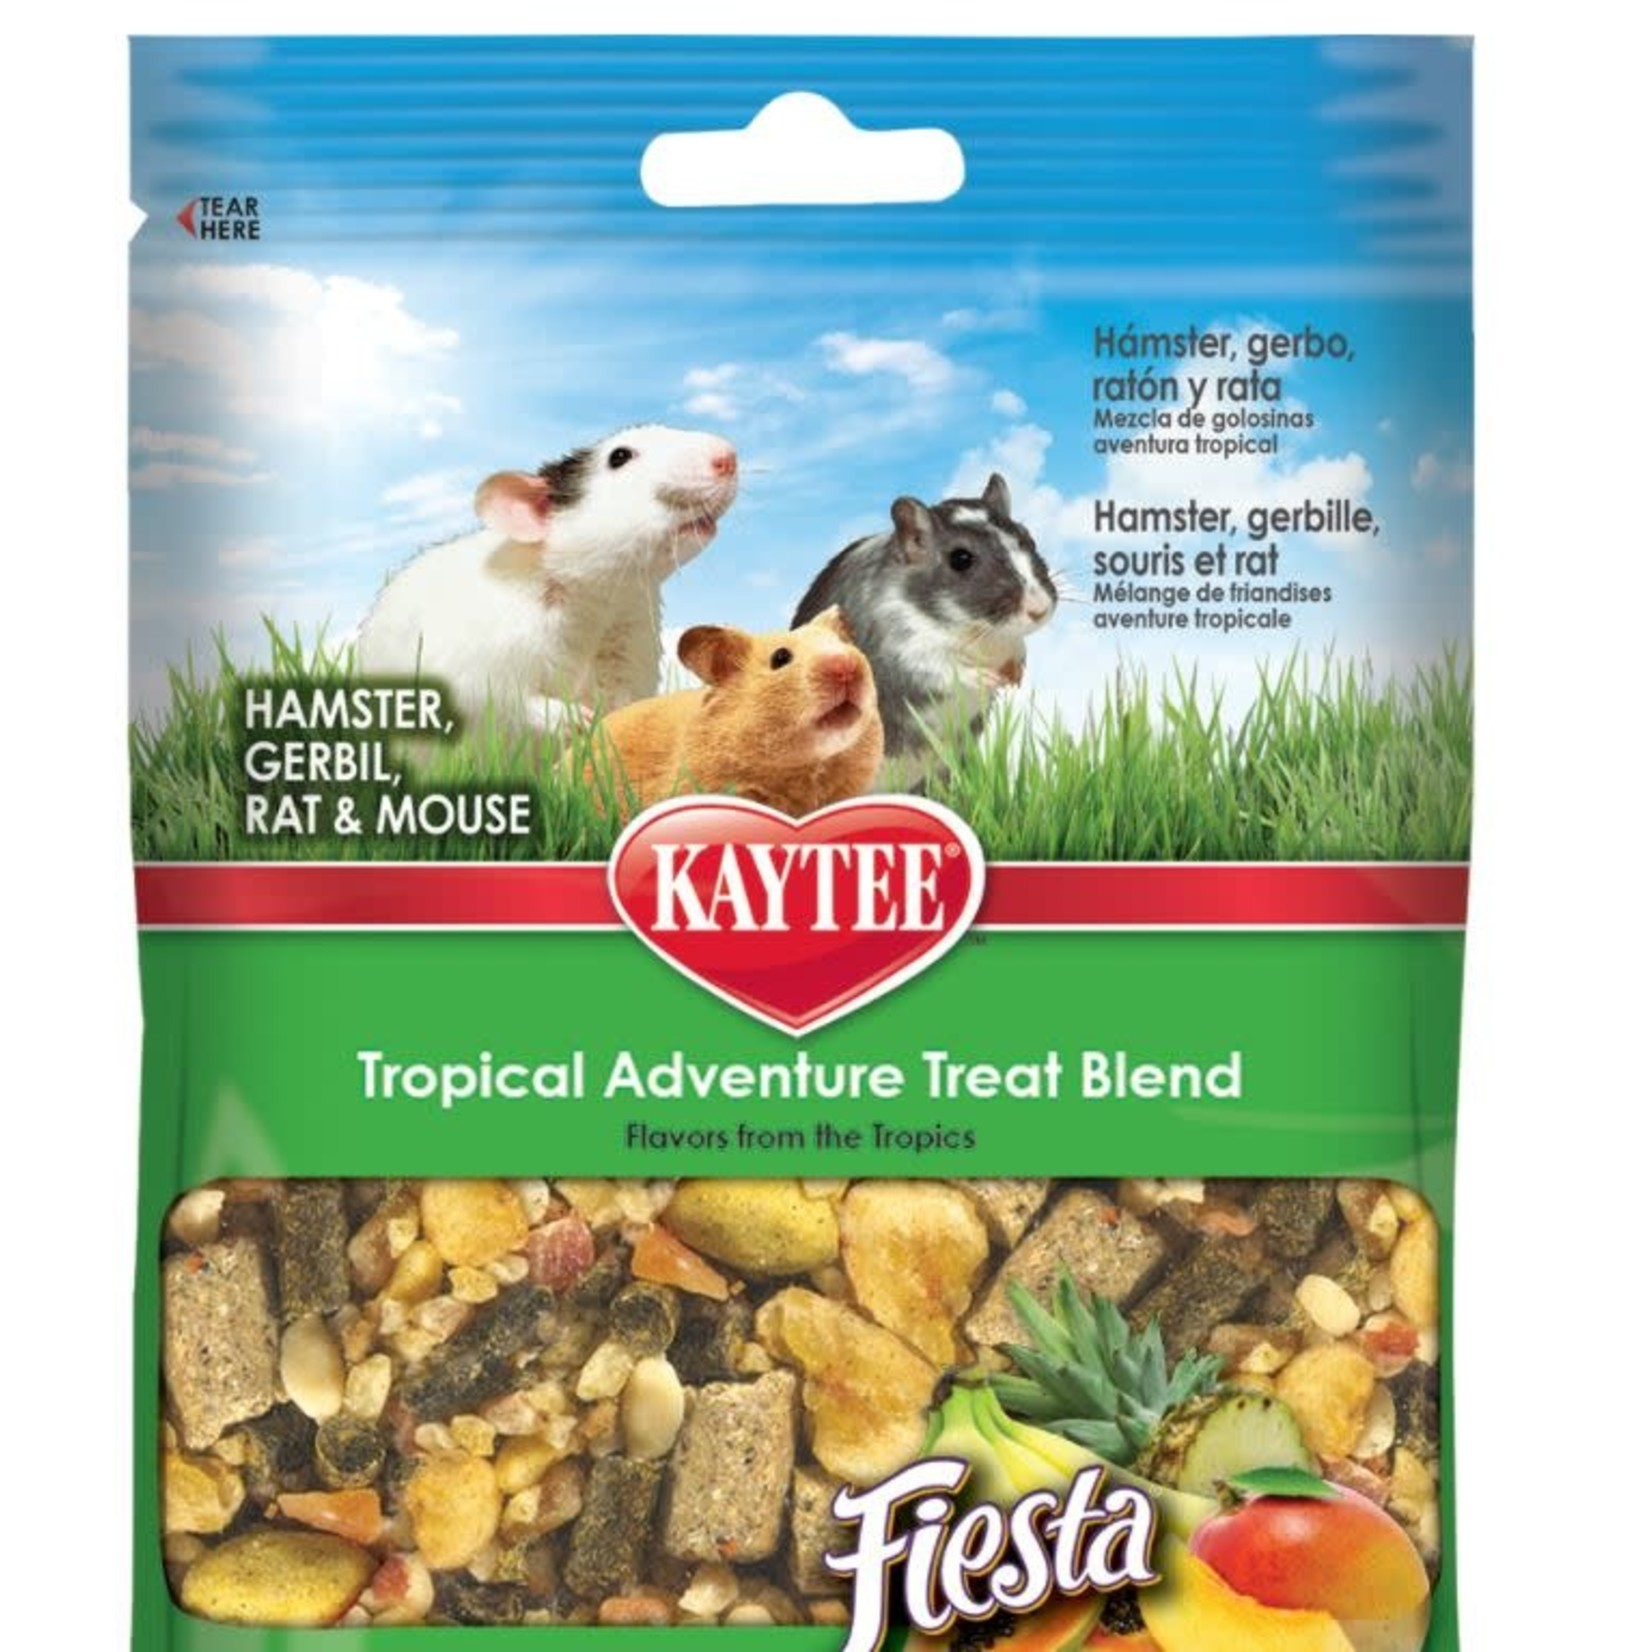 KAYTEE Kaytee Tropical Adventure Treat Blend for Small Pet 198.4g